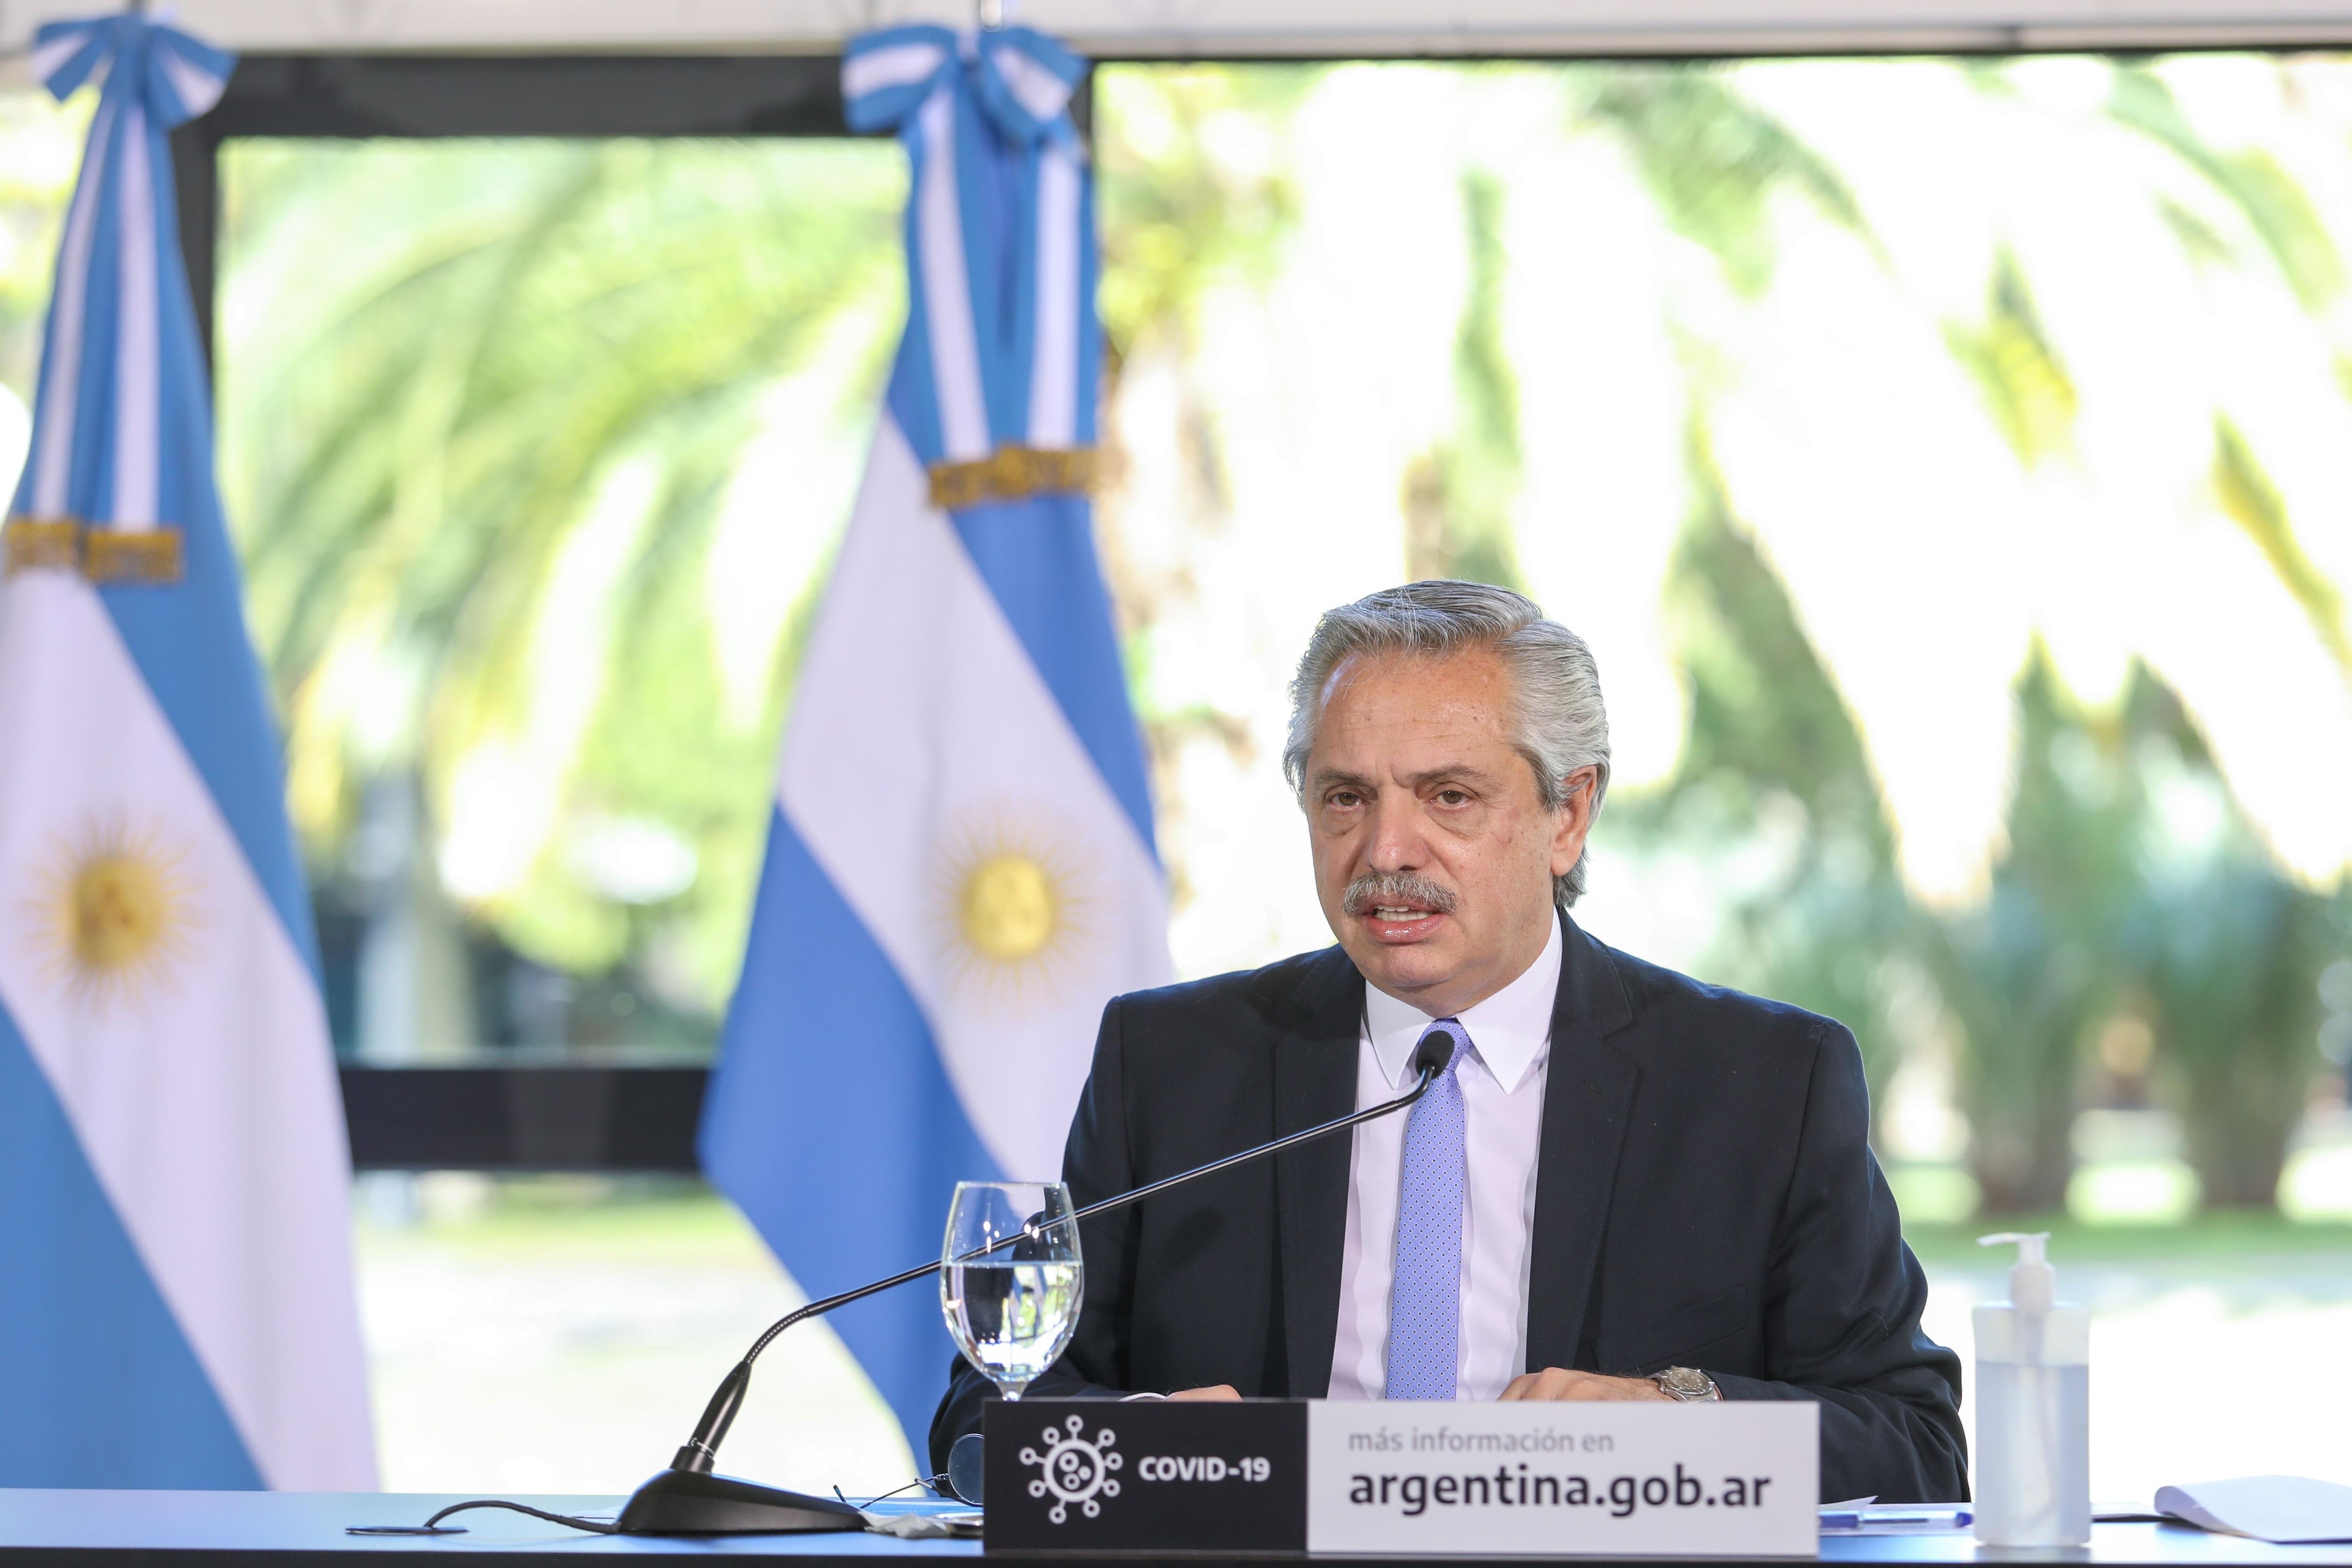 26/06/2020 El presidente de Argentina, Alberto Fernández ECONOMIA INTERNACIONAL Esteban Collazo/Presidencia Arge / DPA